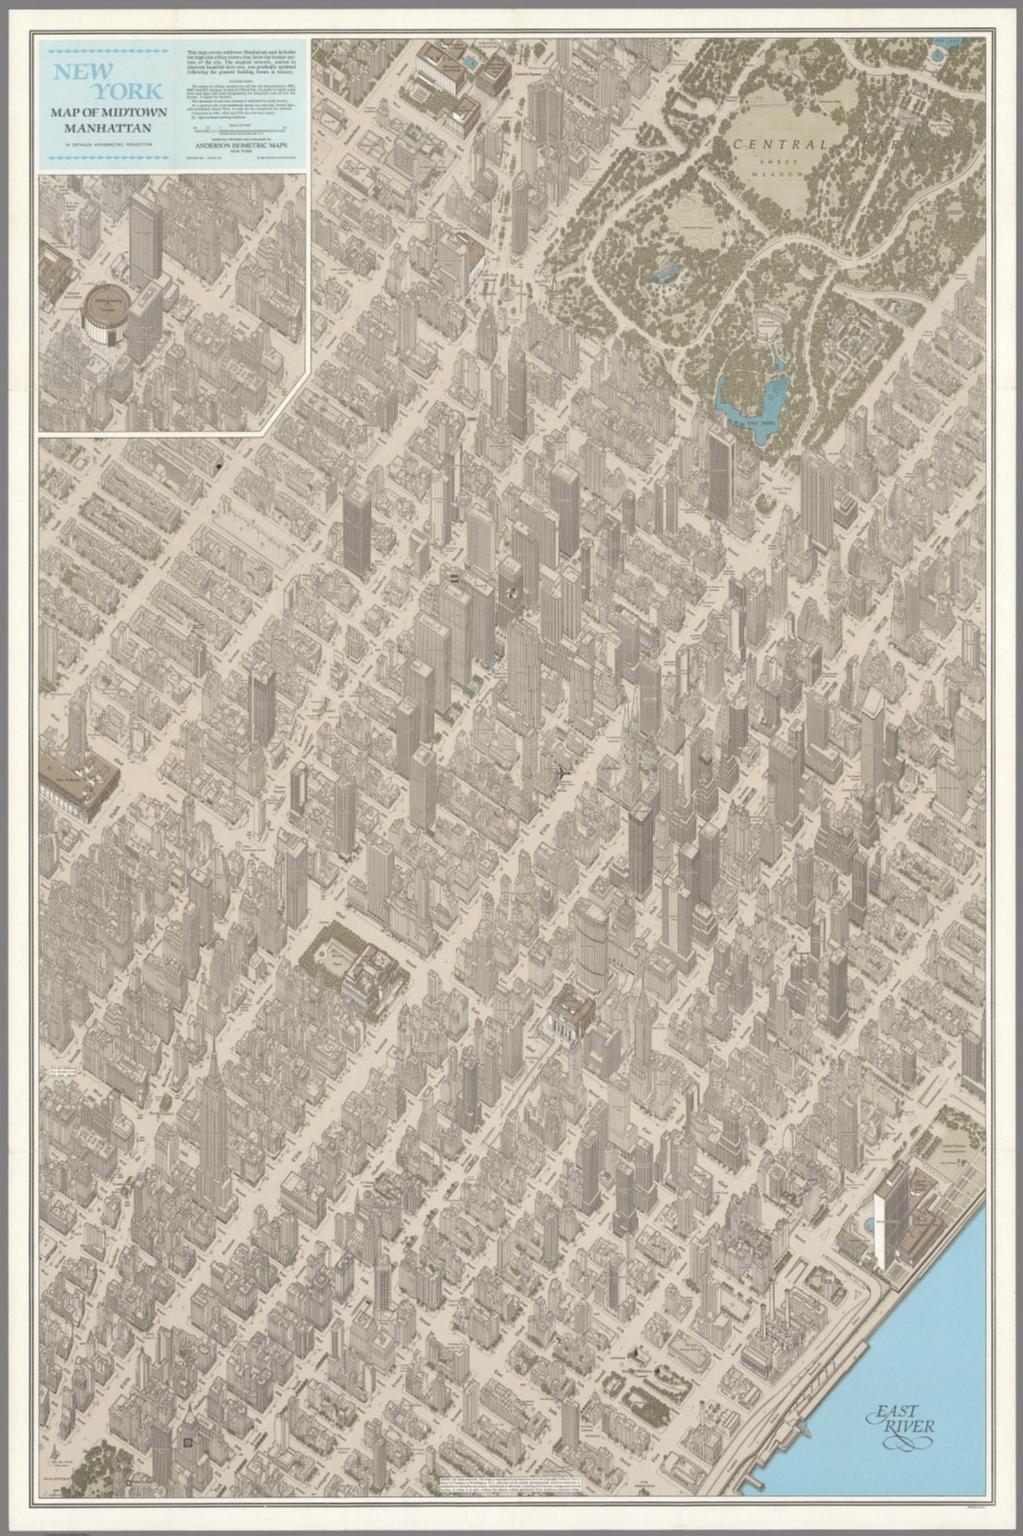 new york map of midtown manhattan